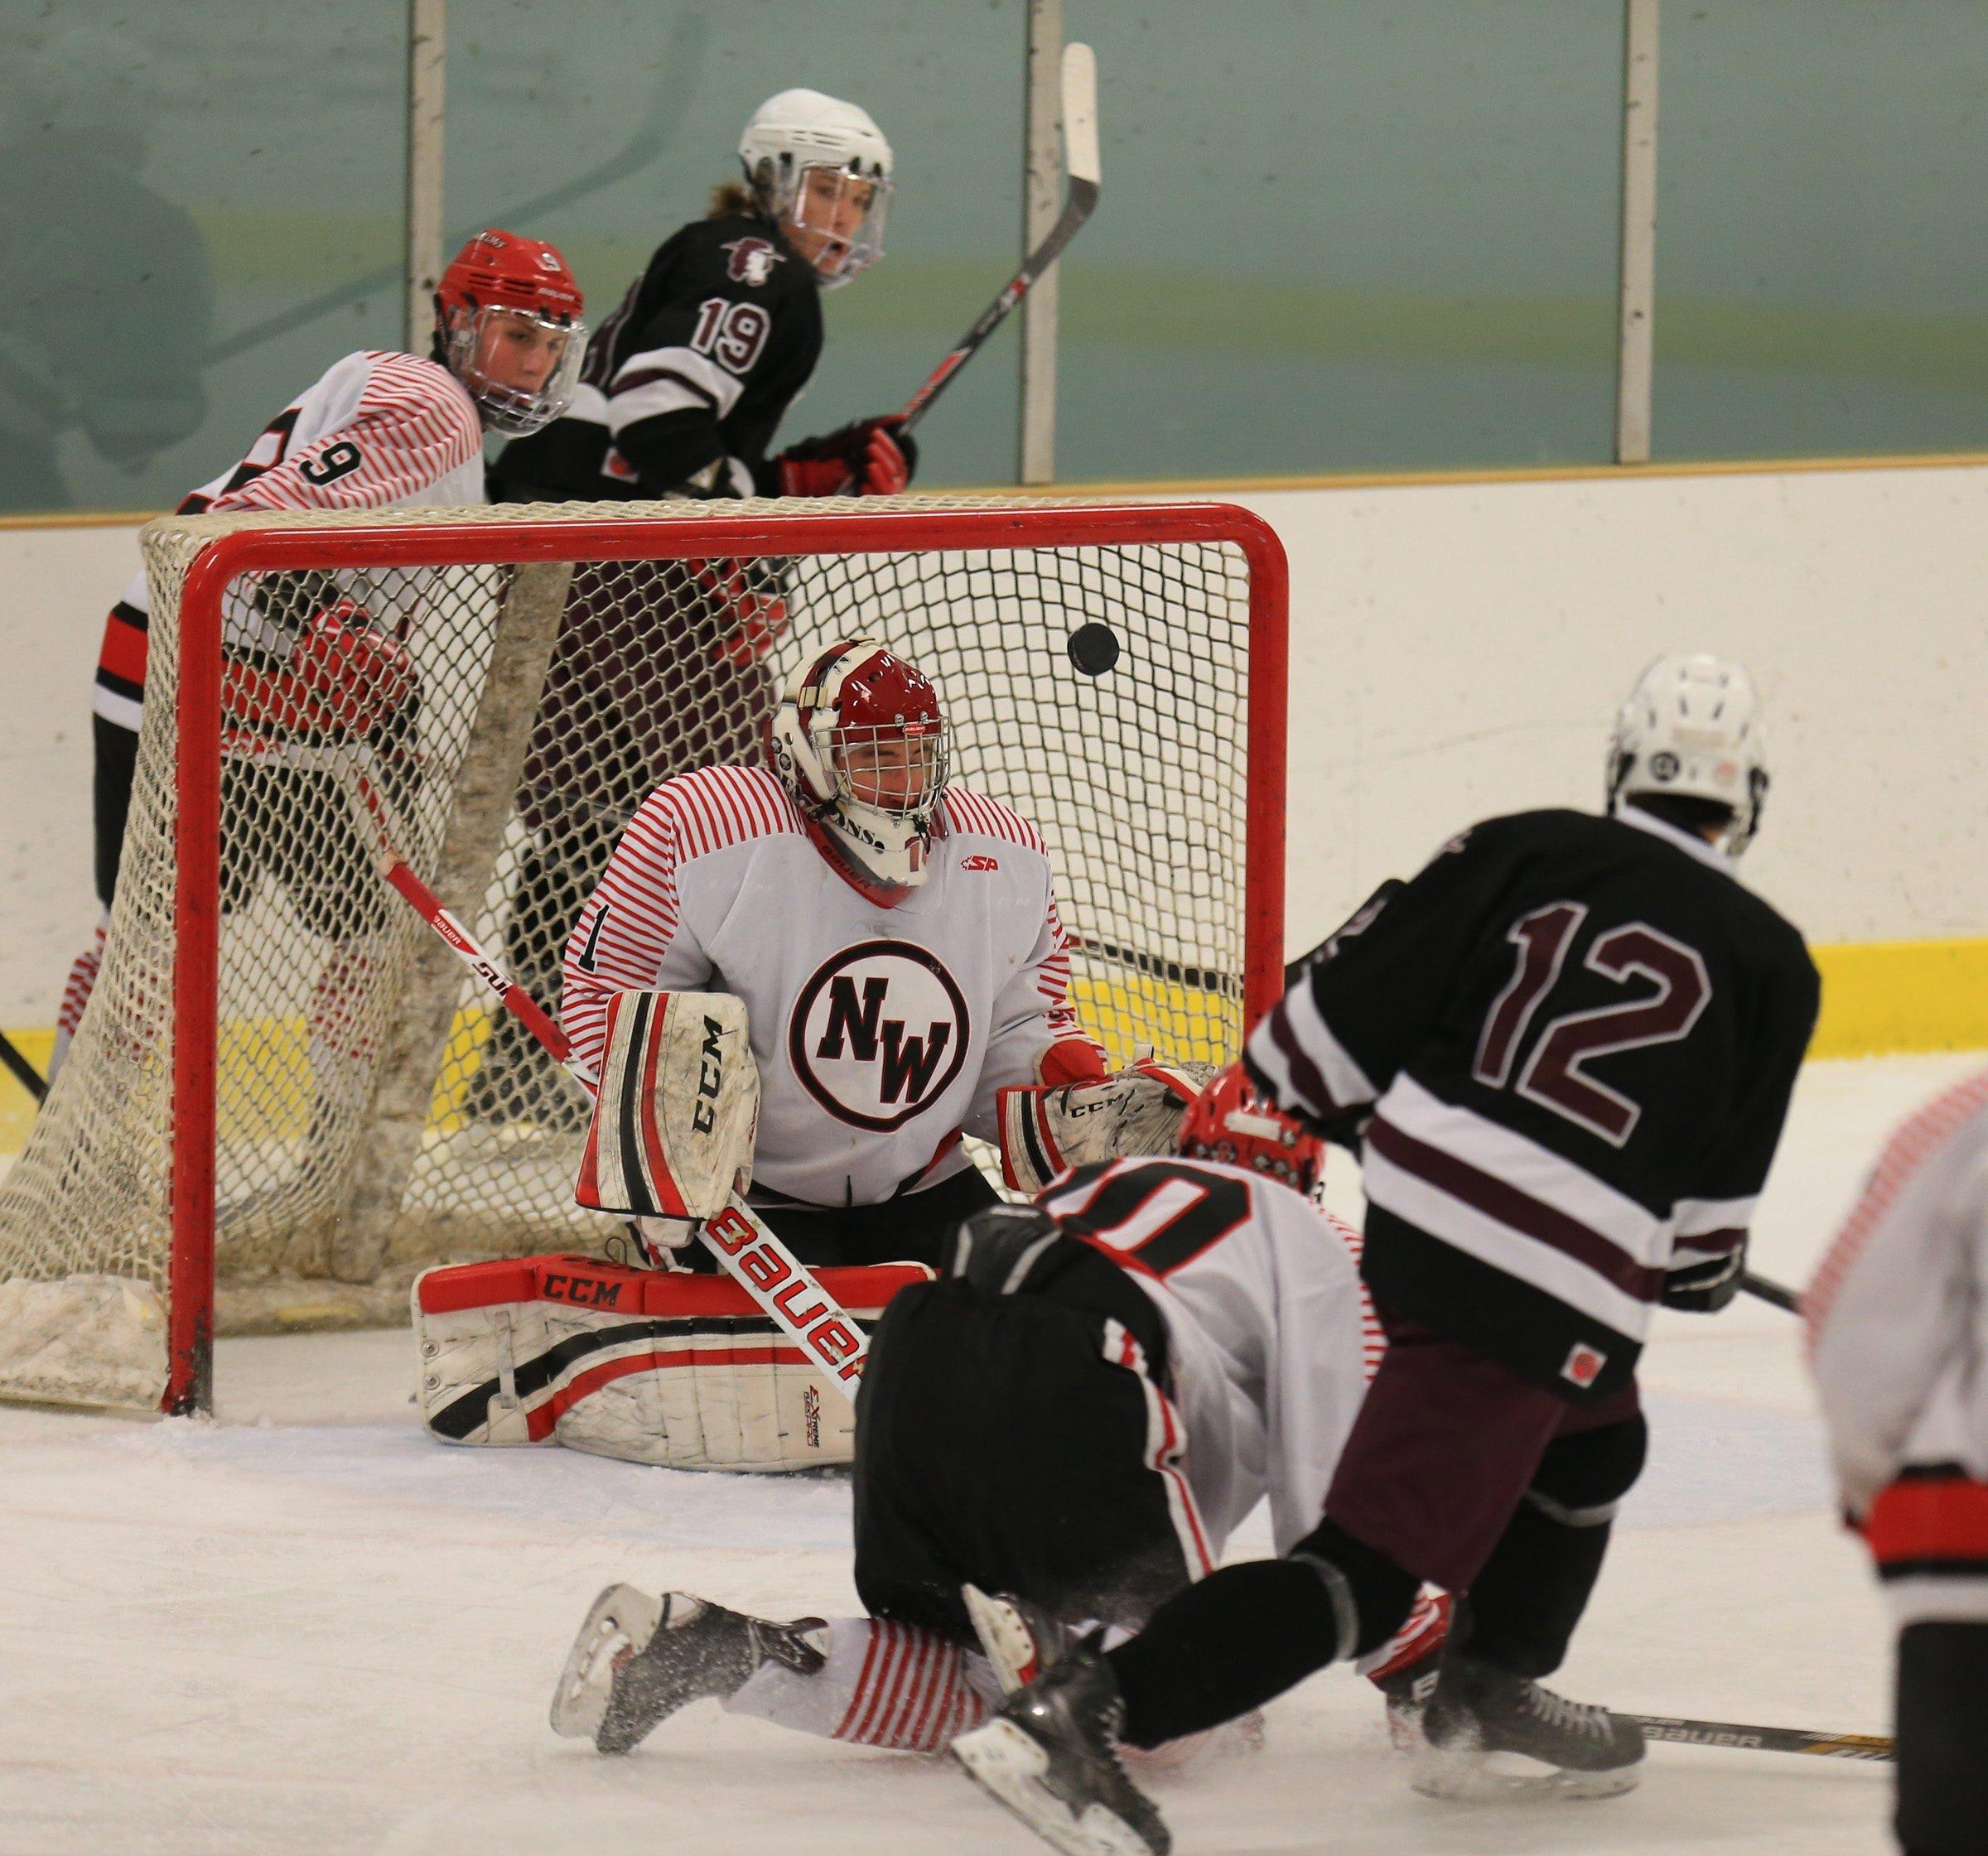 Orchard Park's Zach Biasillo (12) scores on  Niagara-Wheatfield goaltender Casey Wall during first-period action Saturday.